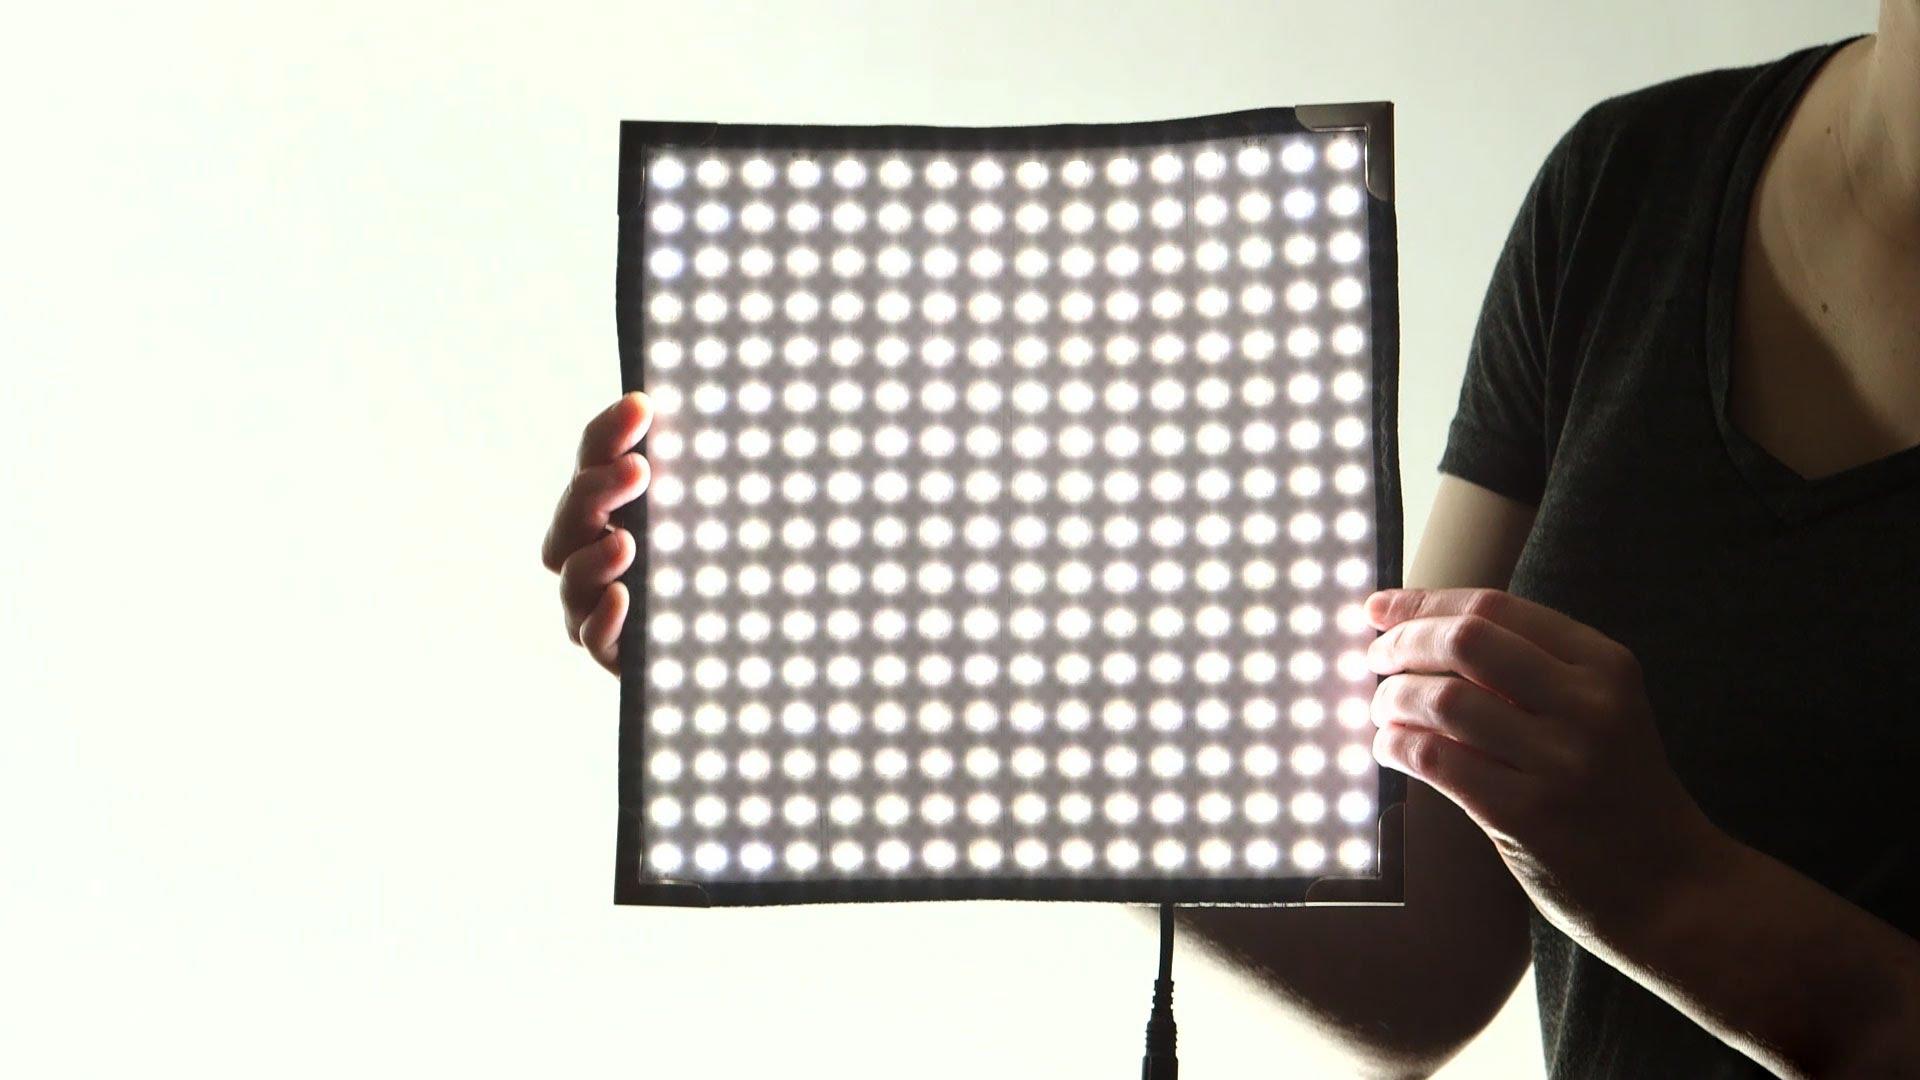 Quick Look: Flexlight